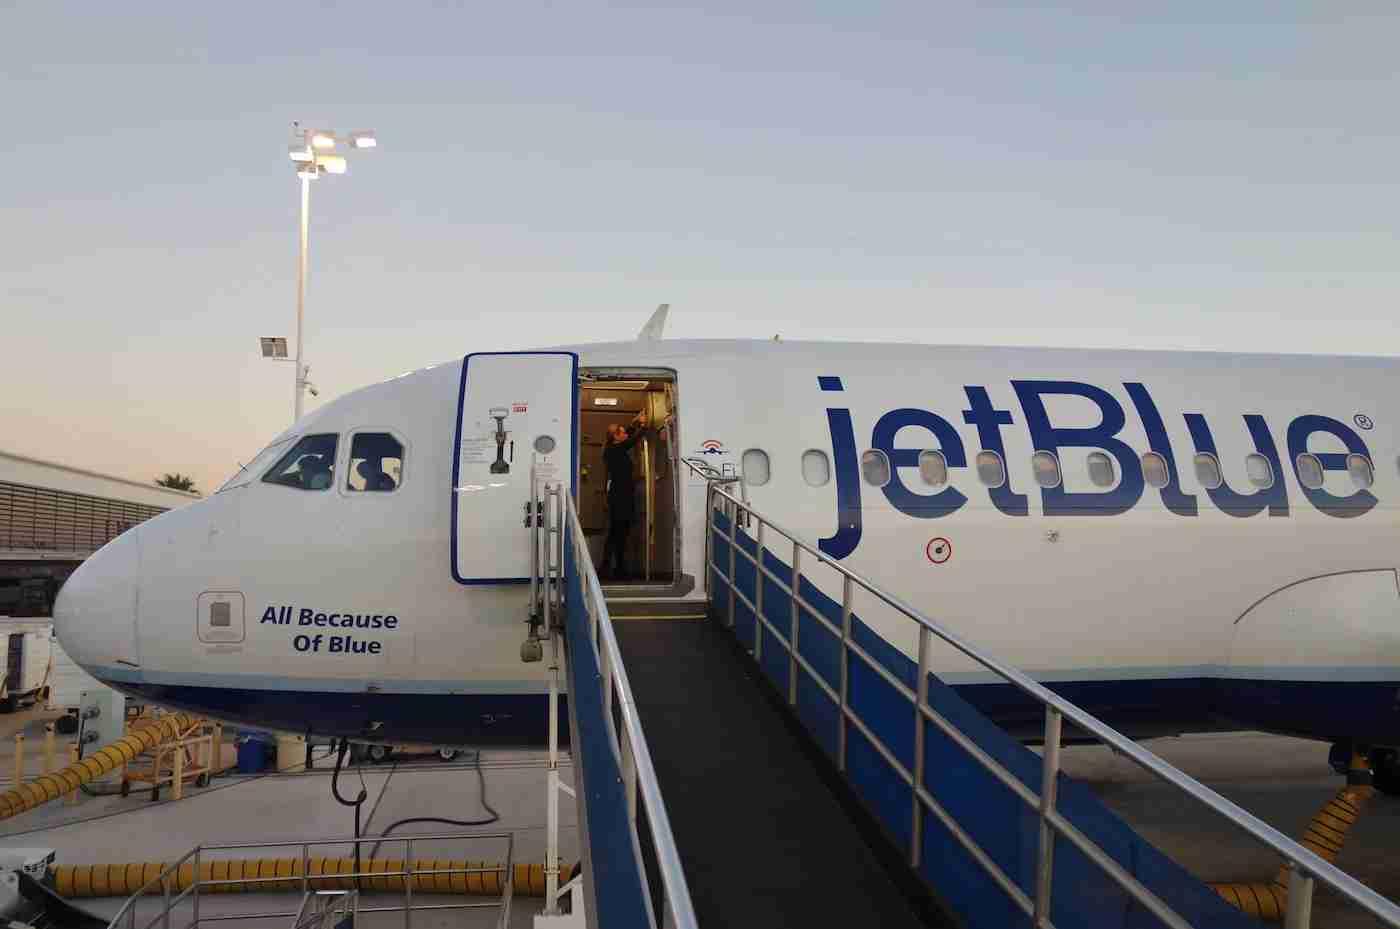 JetBlue plane with a jetbridge attached